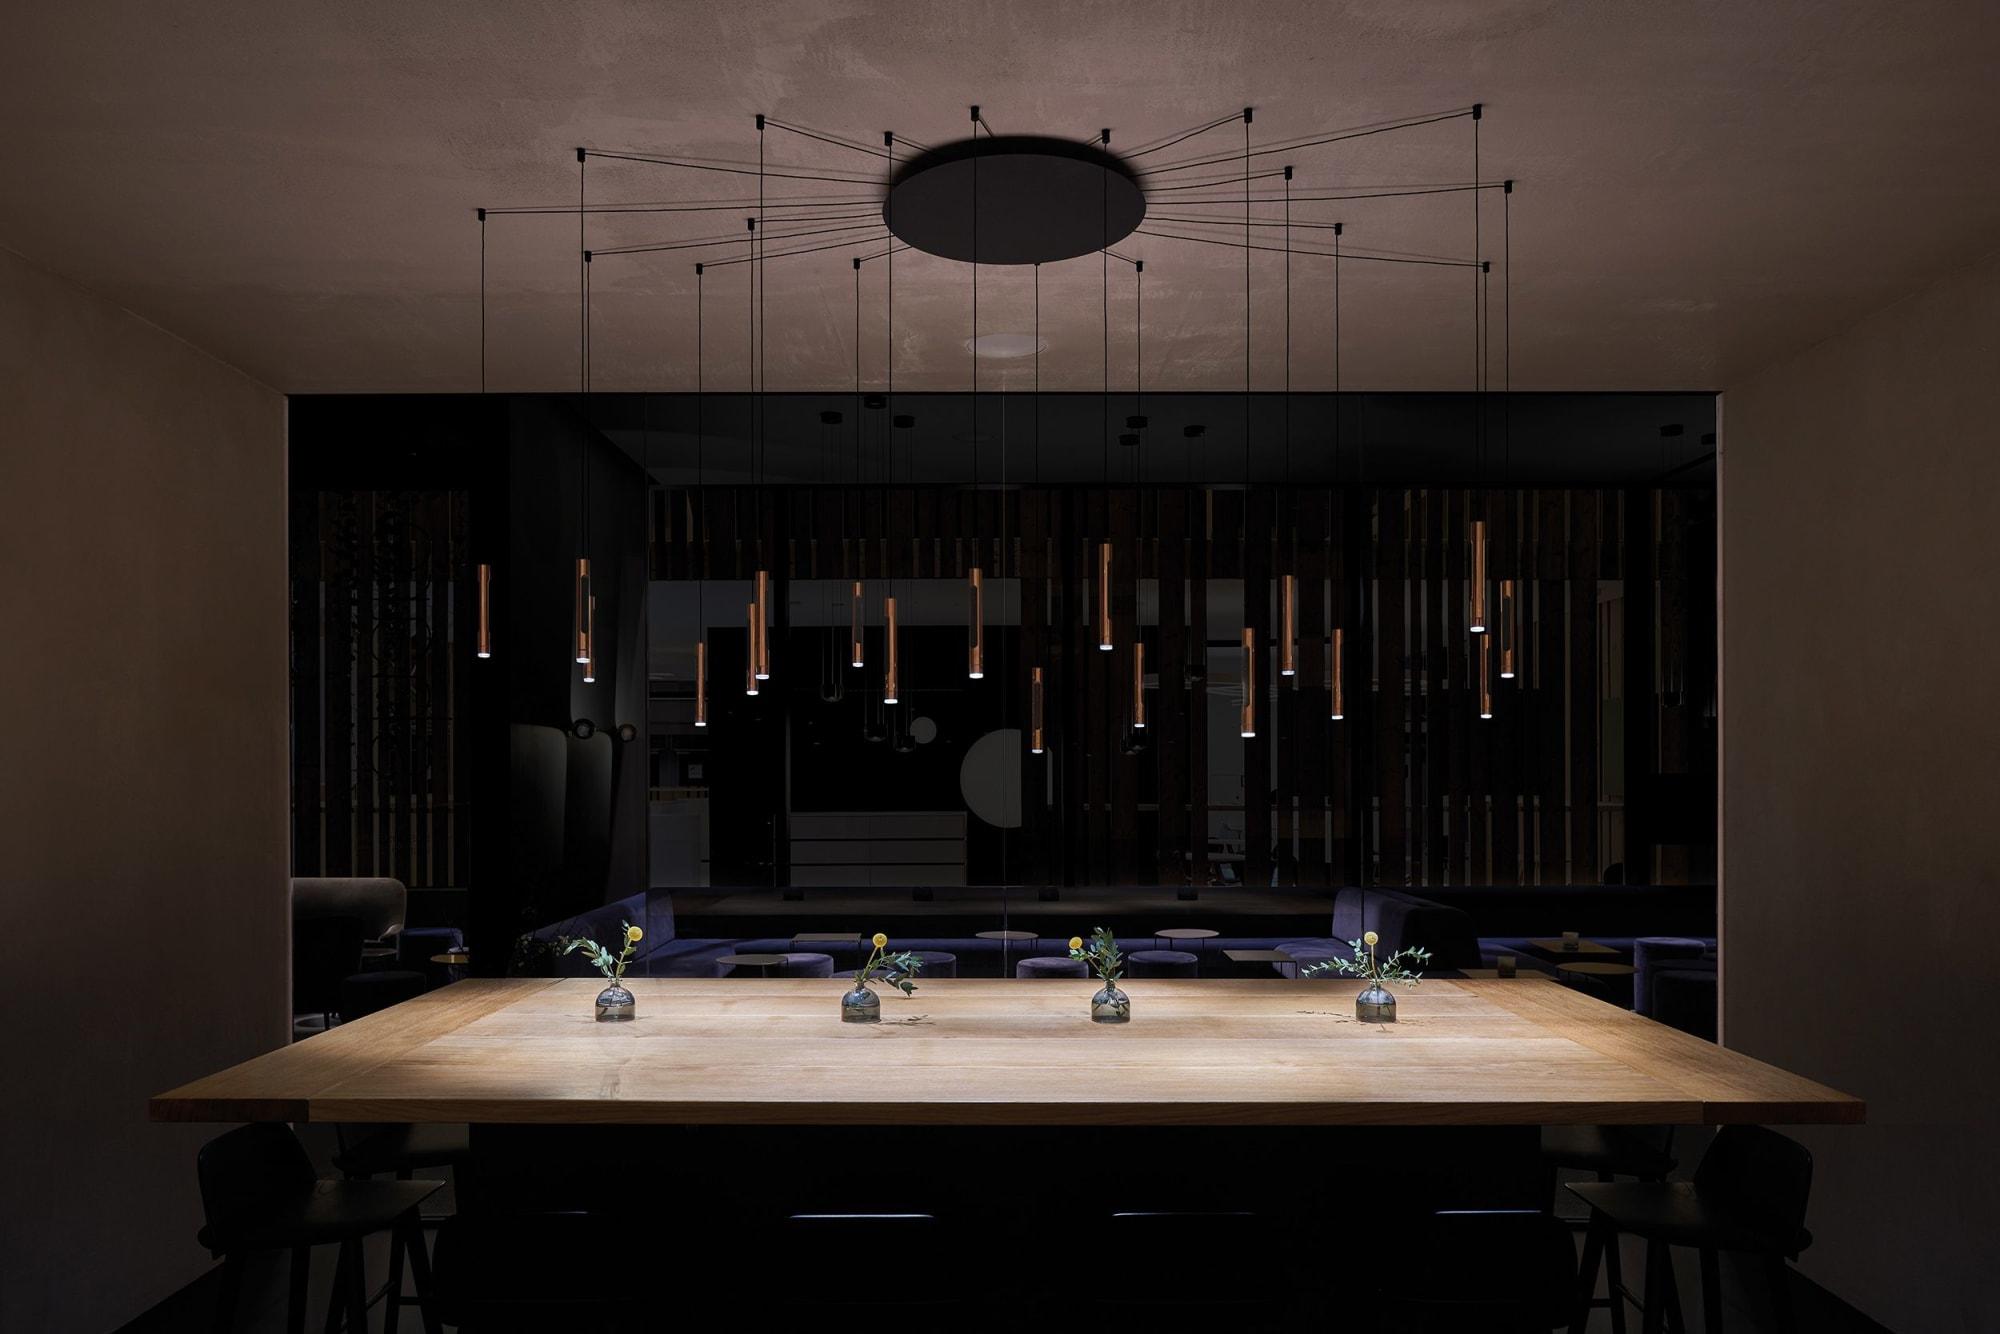 Interior Design by 1zu33 seen at Frankfurt(Main) Messe, Frankfurt - Booth at Light+Building 2018, Occhio